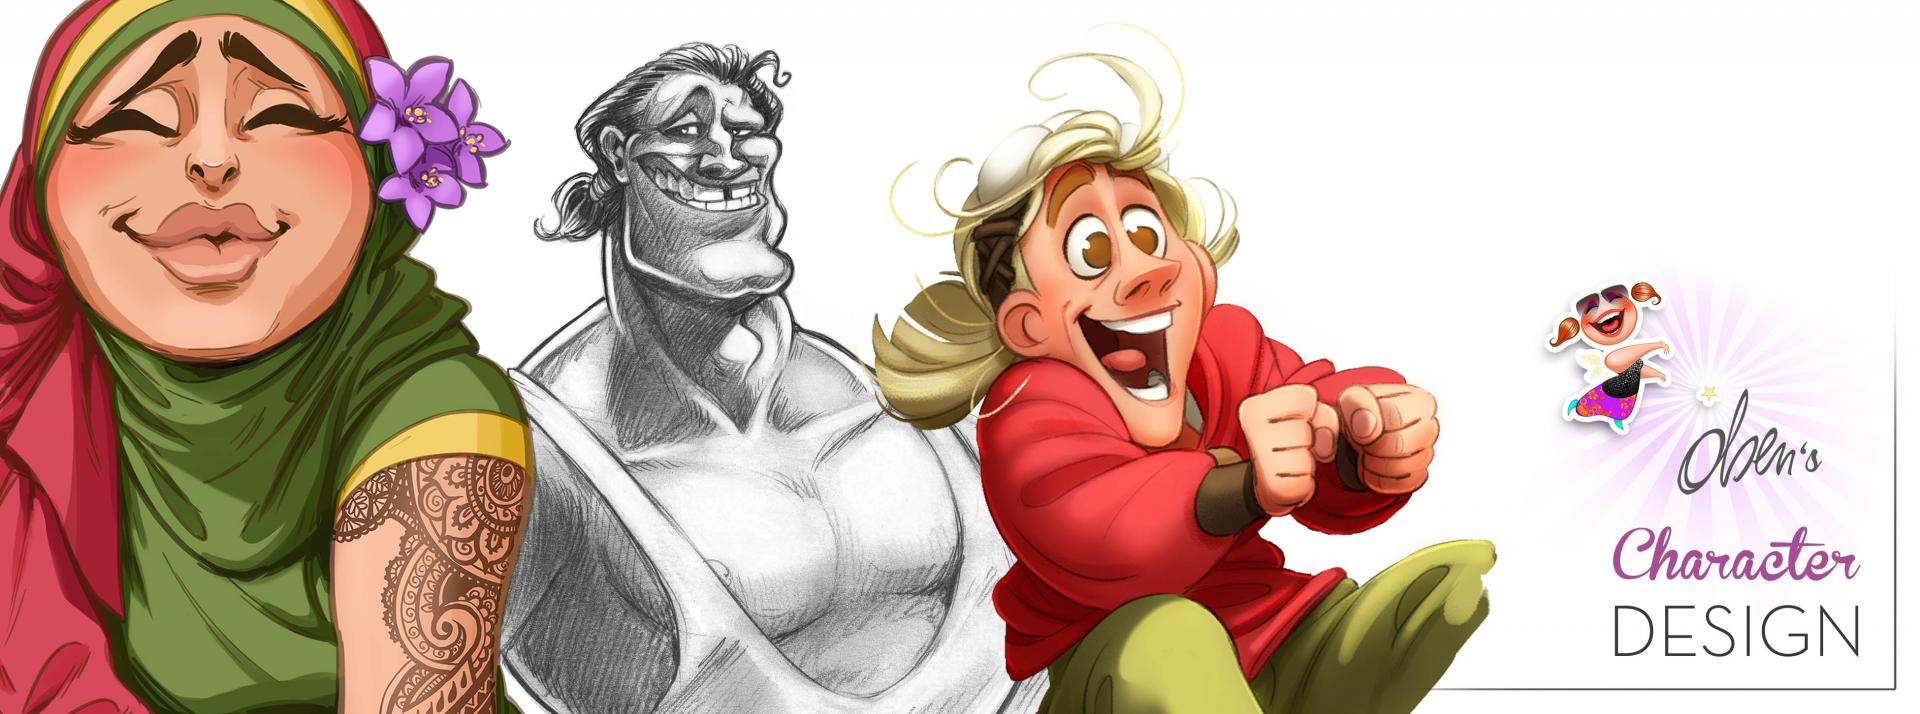 Olsen's Character designs